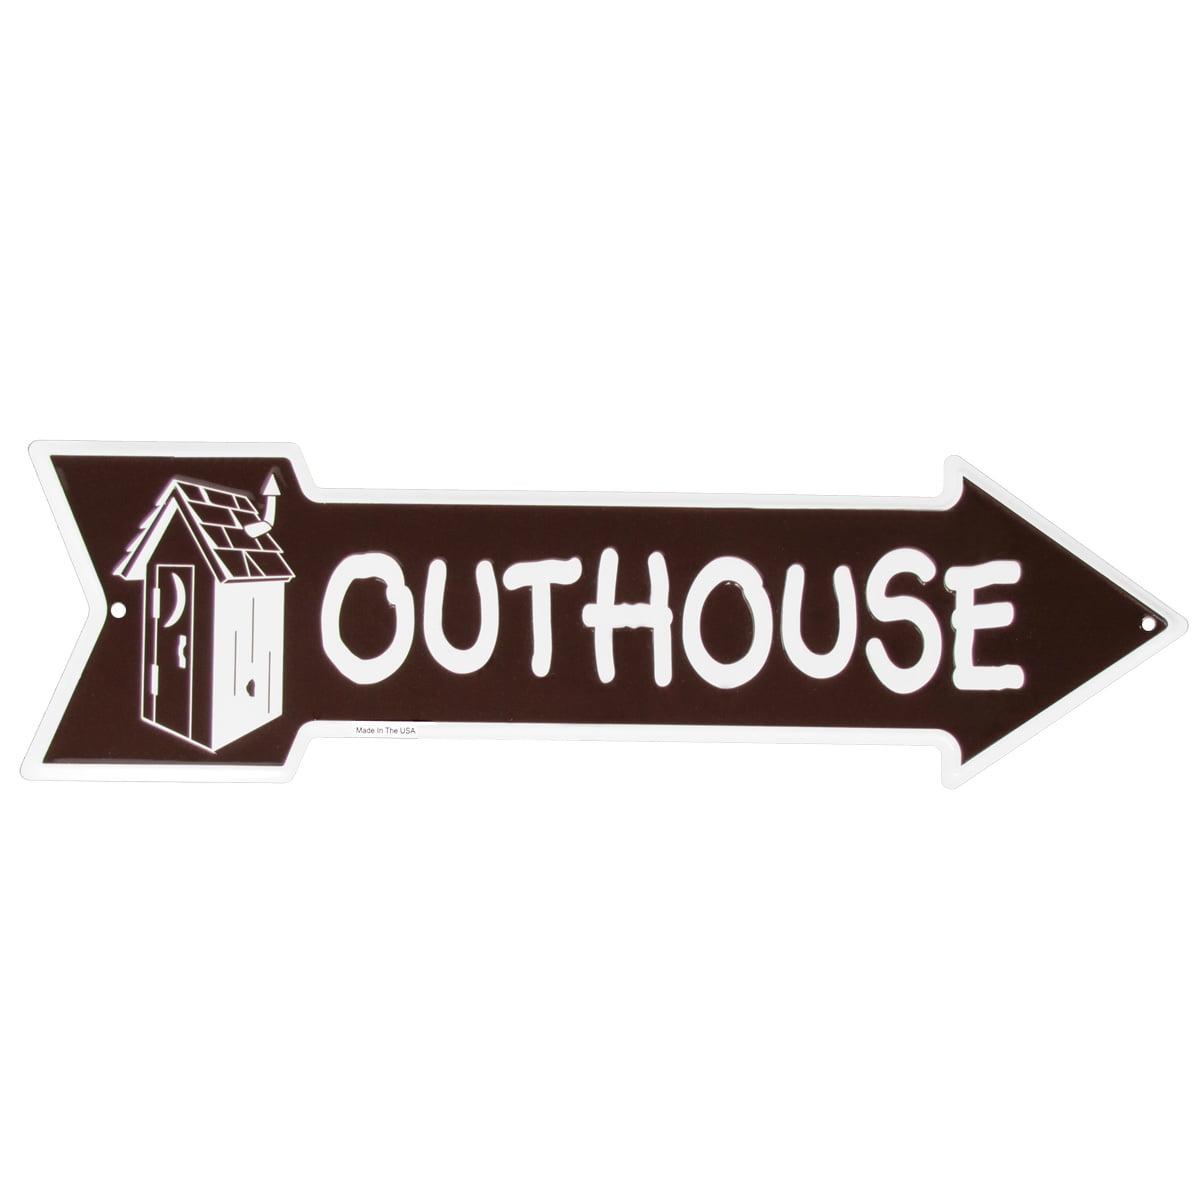 Superieur Tin Metal Outhouse Sign Funny Bathroom Restroom Arrow Garage Bar Pub Wall  Decor